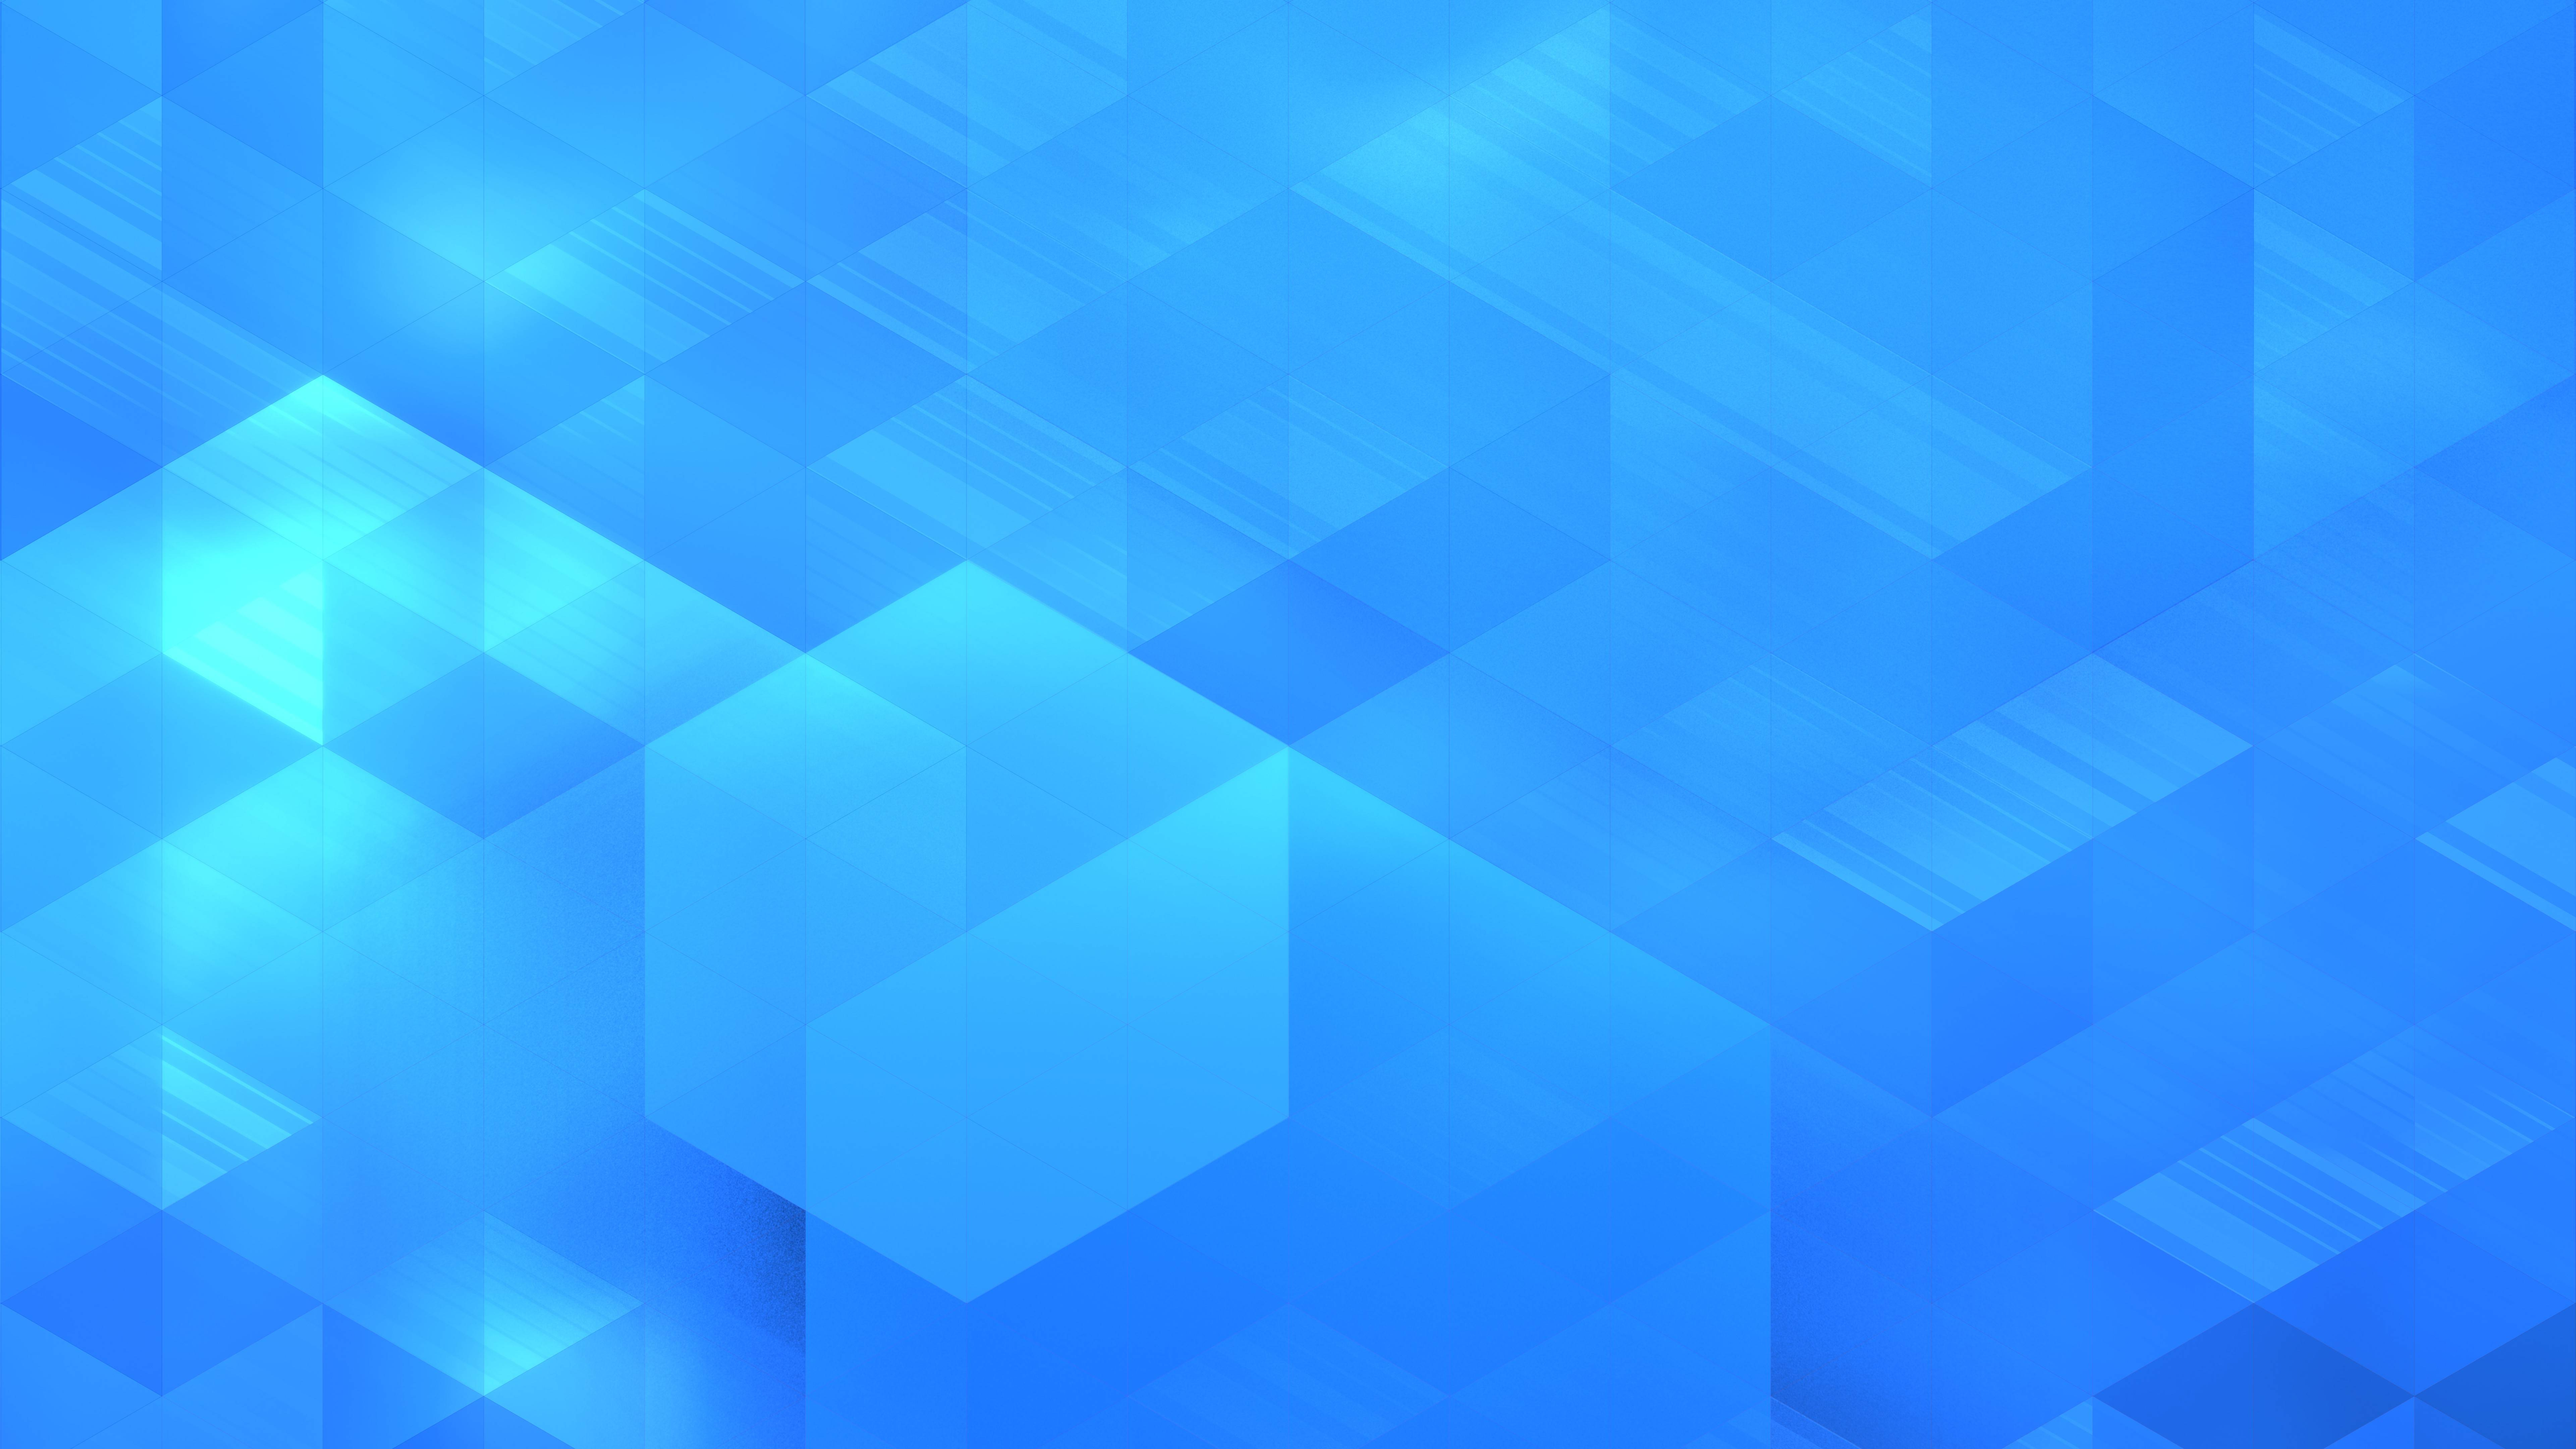 data/resources/wallpapers/Adwaita.jpg